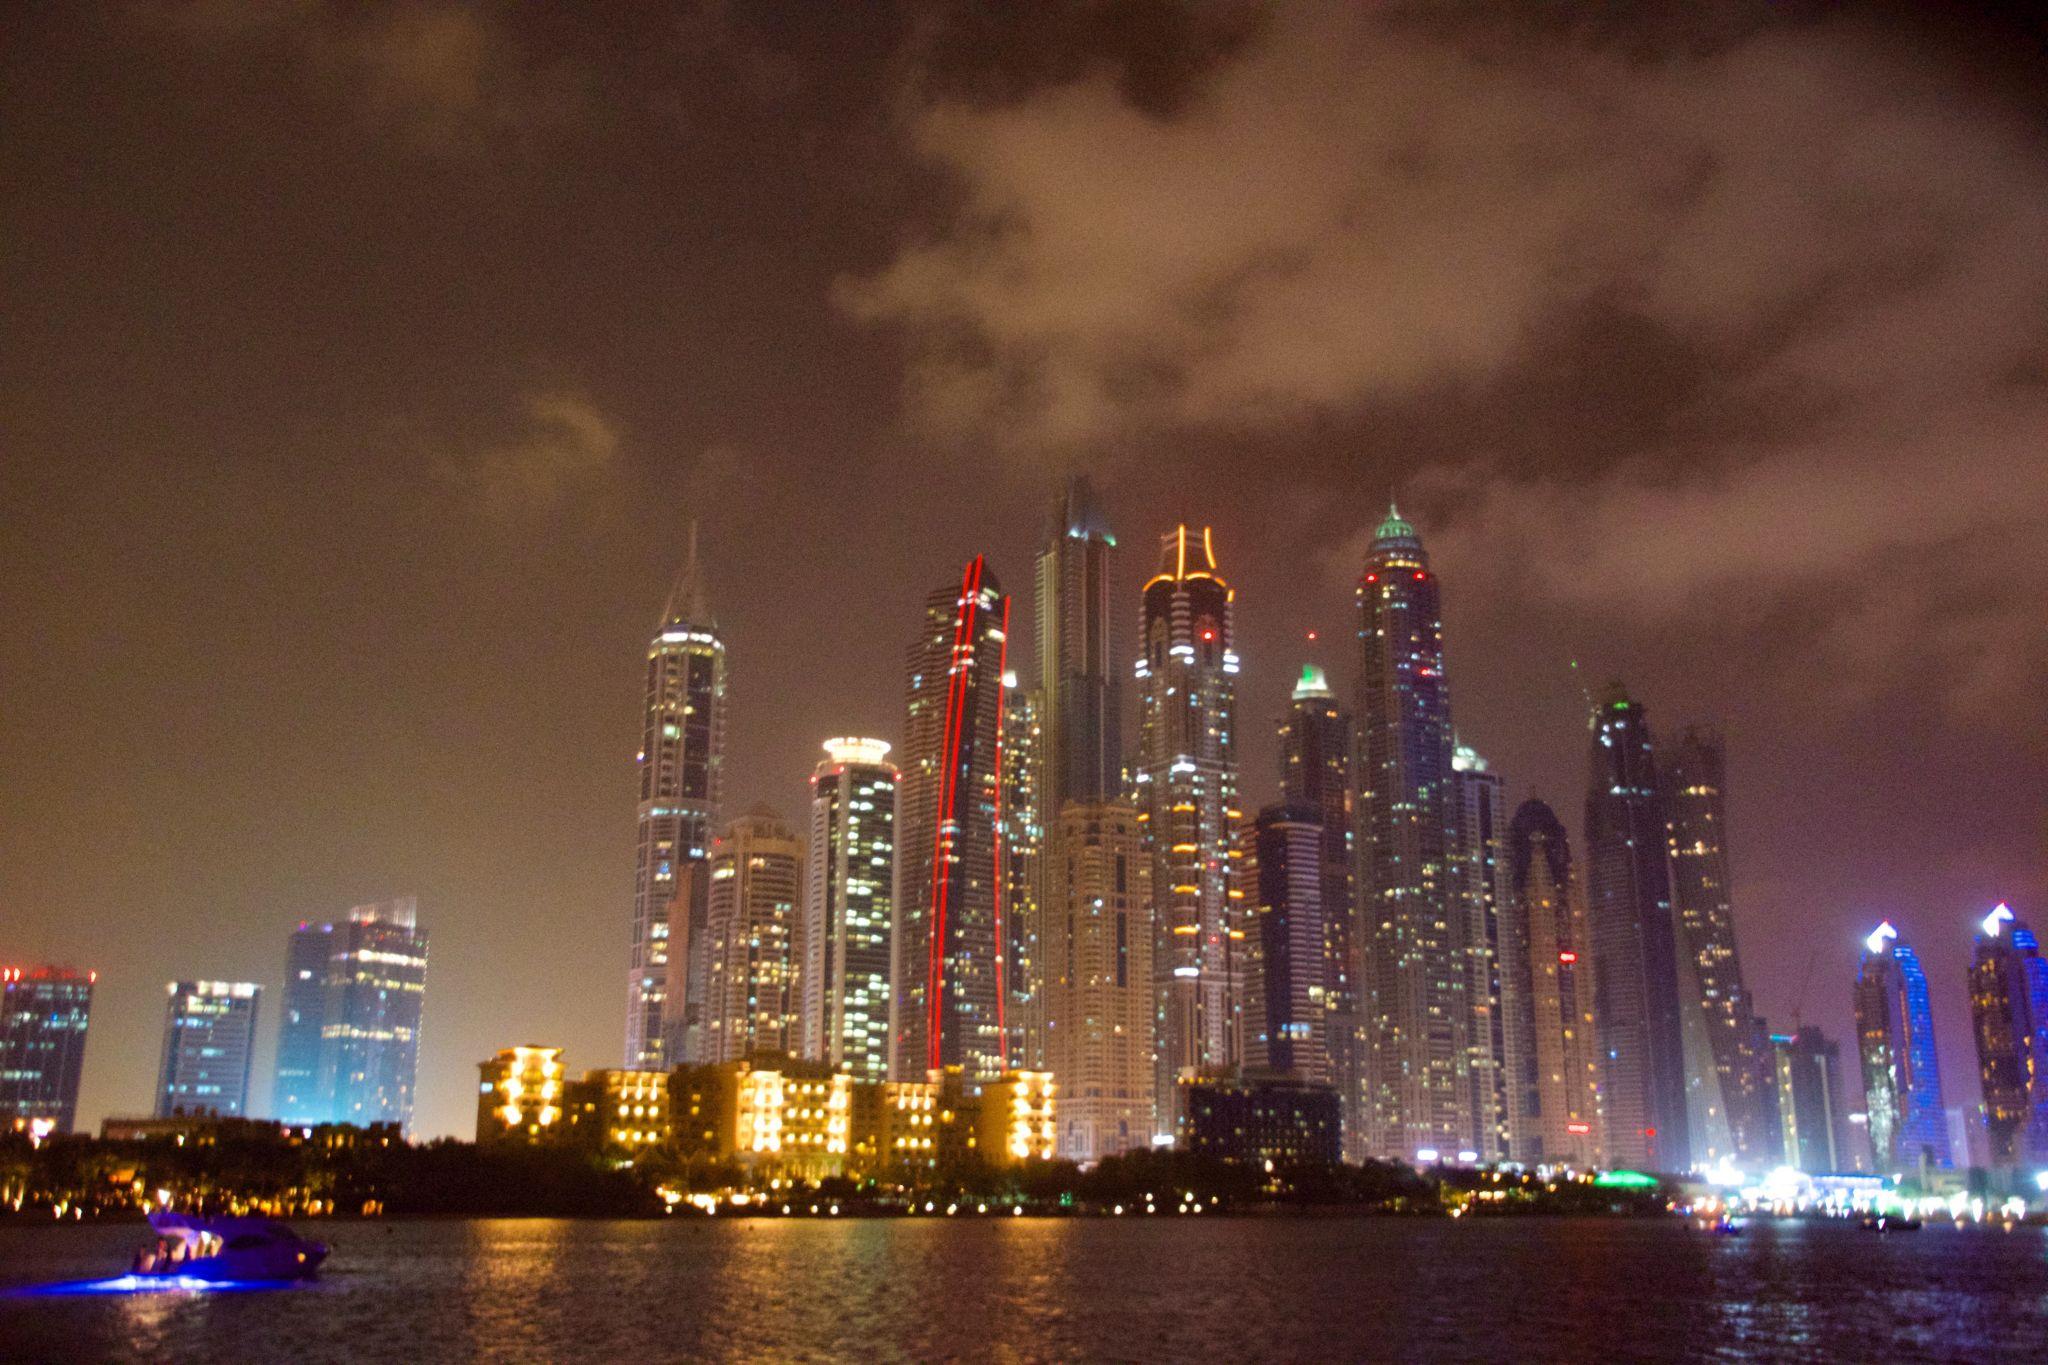 Dubai Marina - Boat-trip at night, United Arab Emirates